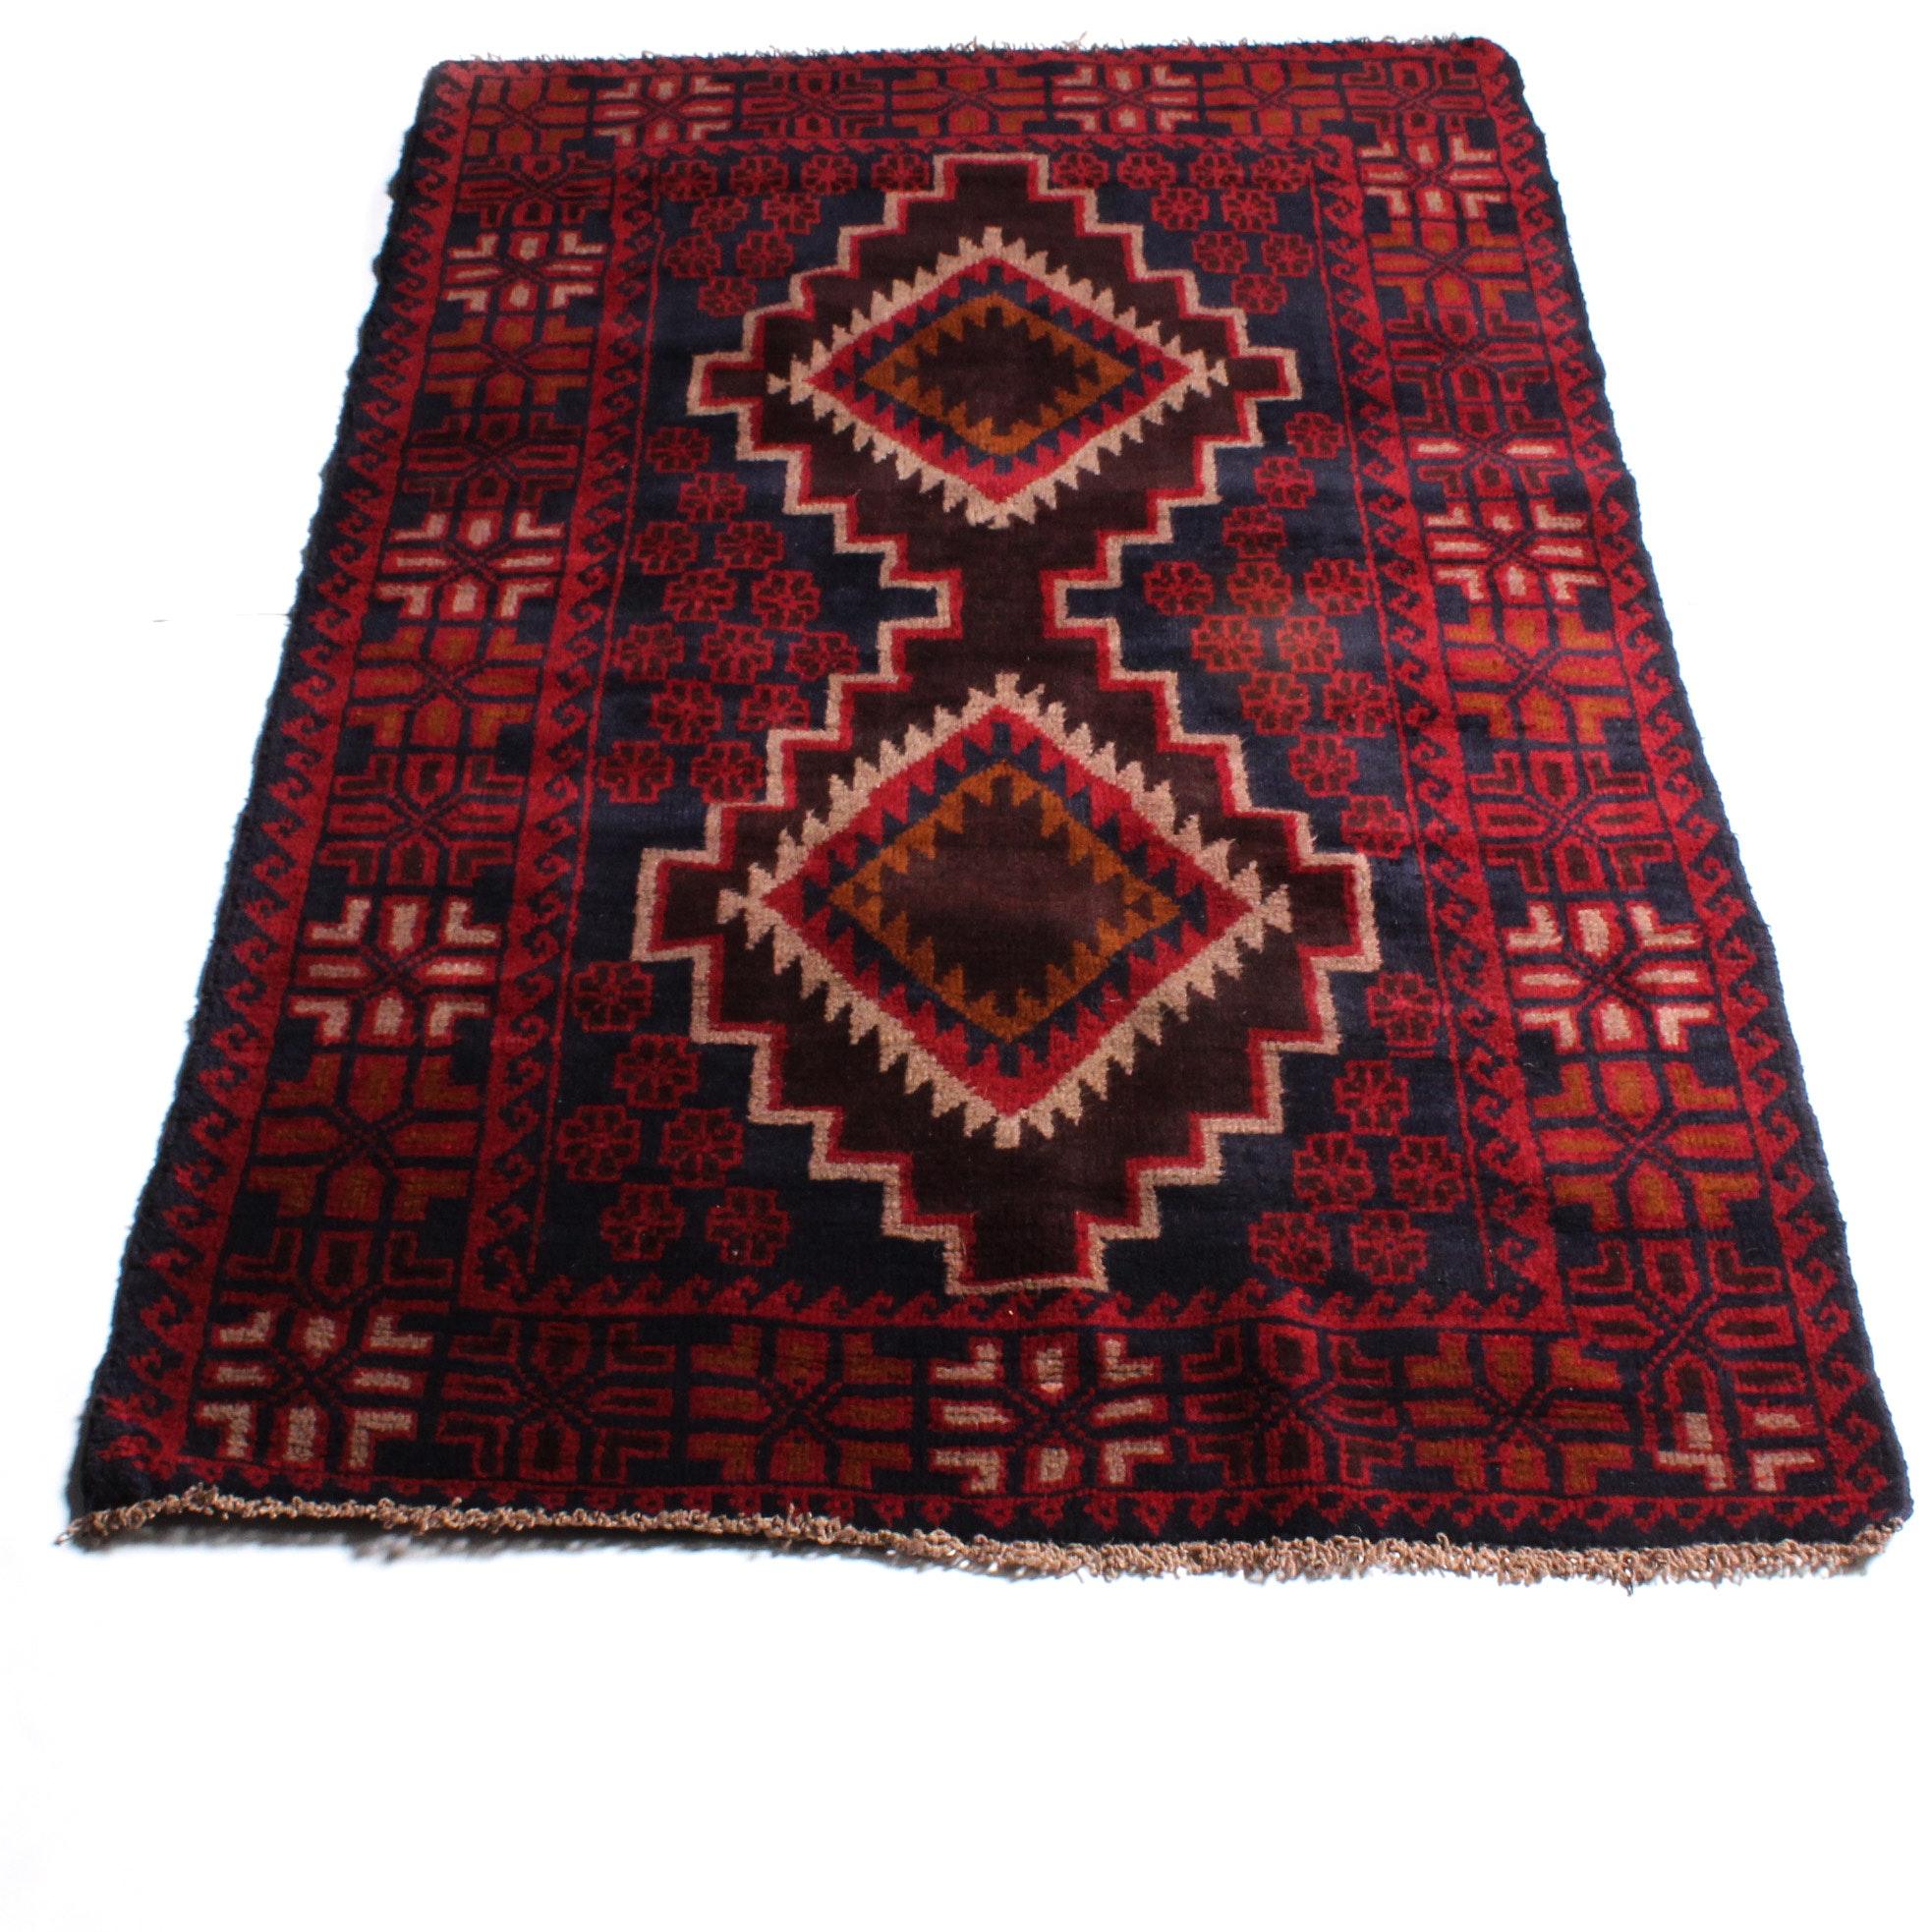 3'8 x 5'11 Hand-Knotted Afghan Kazak Rug